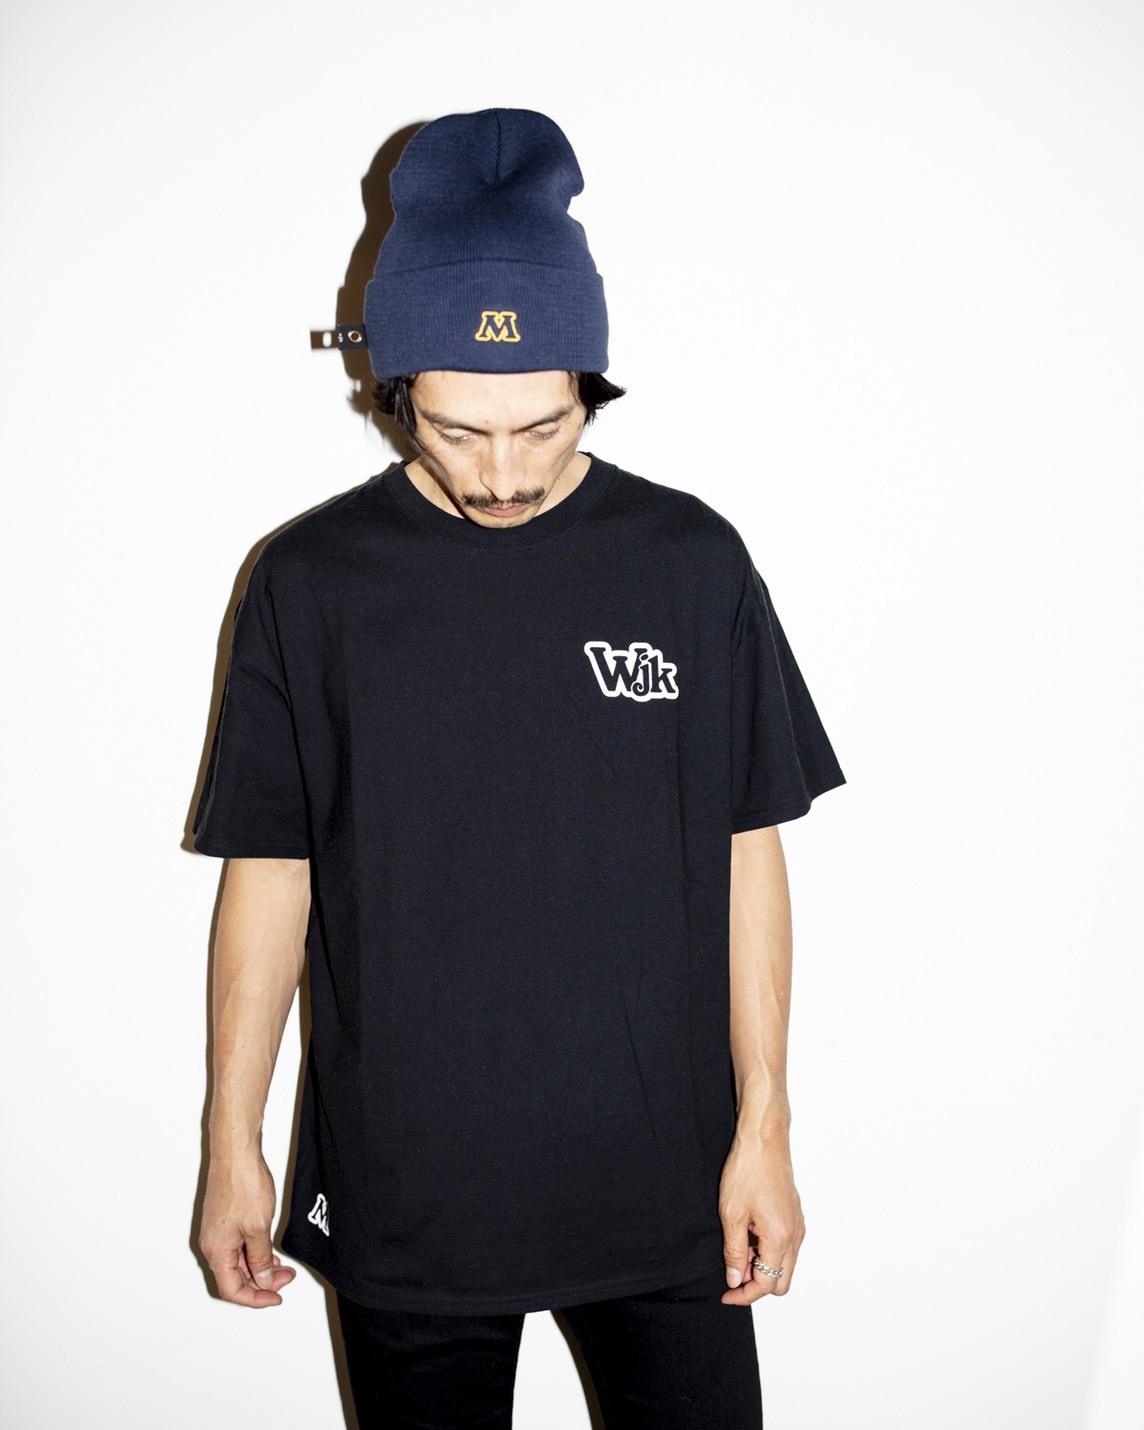 M×wjk コラボレーションTシャツ_e0036919_14120839.jpg